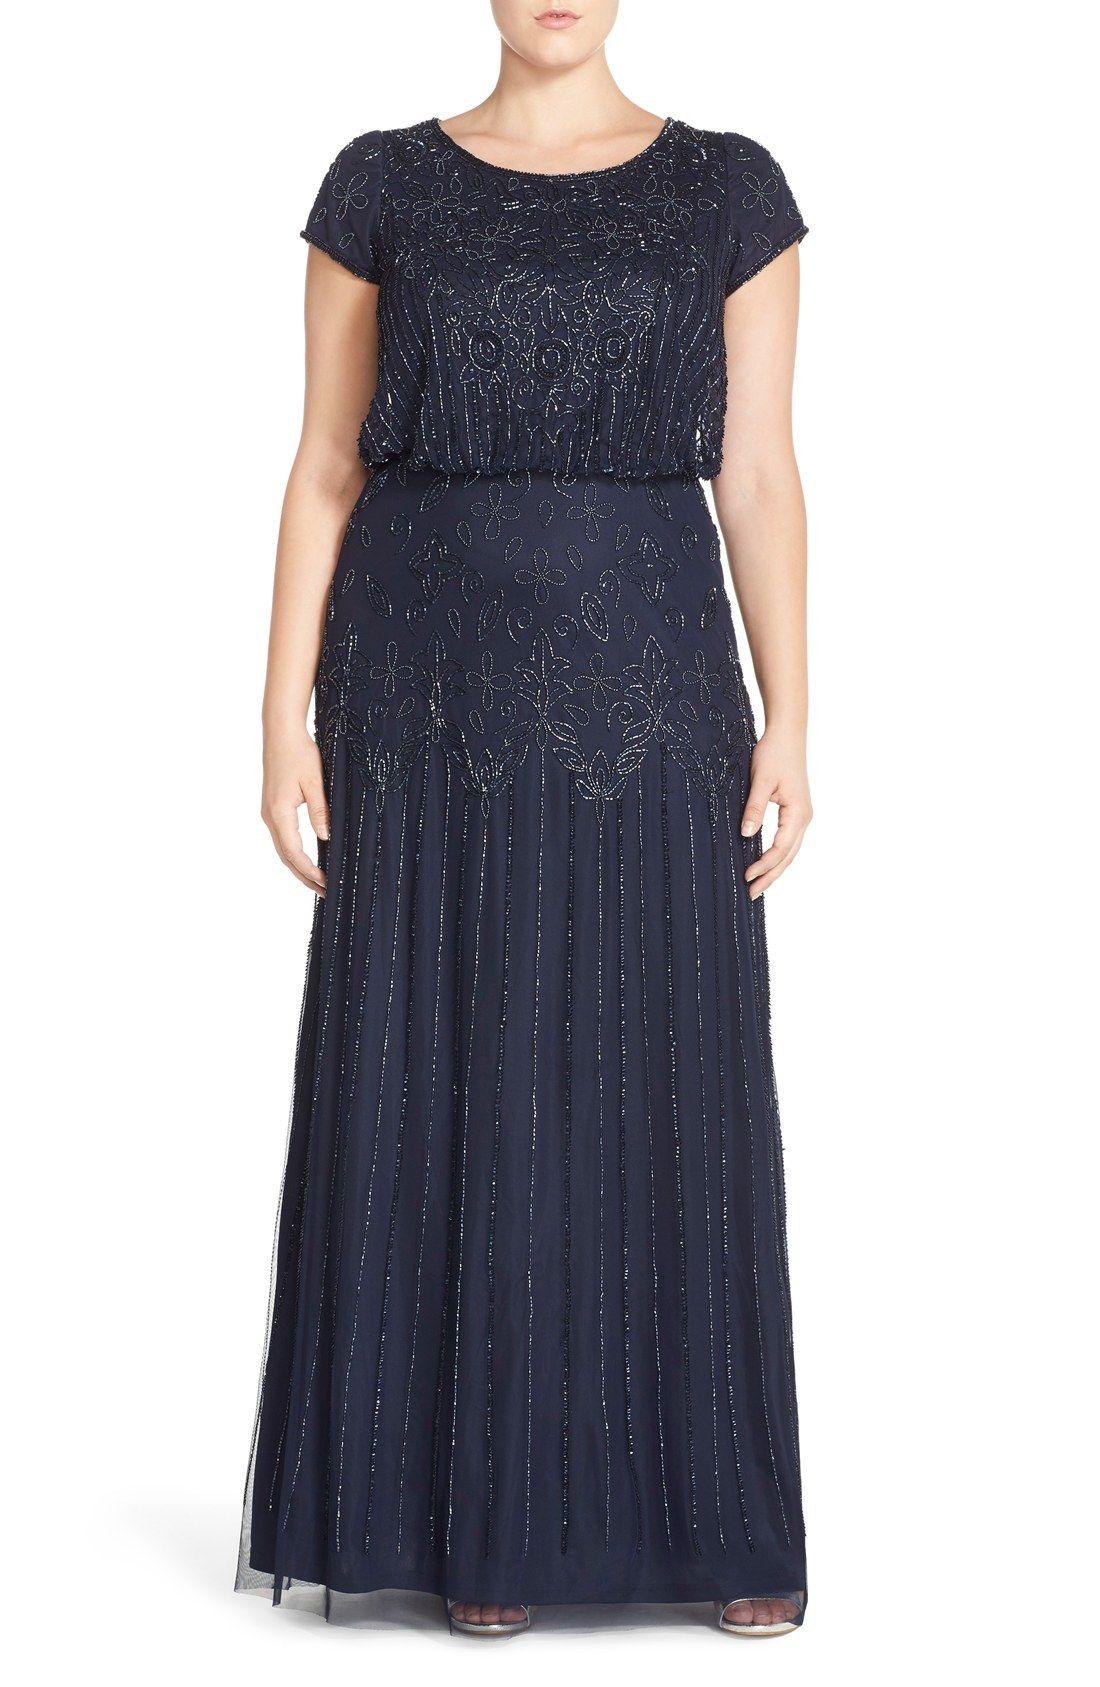 Adrianna Papell Beaded Blouson Gown Plus Size Nordstrom Plus Size Dresses Plus Size Evening Gown Evening Dresses Plus Size [ 1687 x 1100 Pixel ]